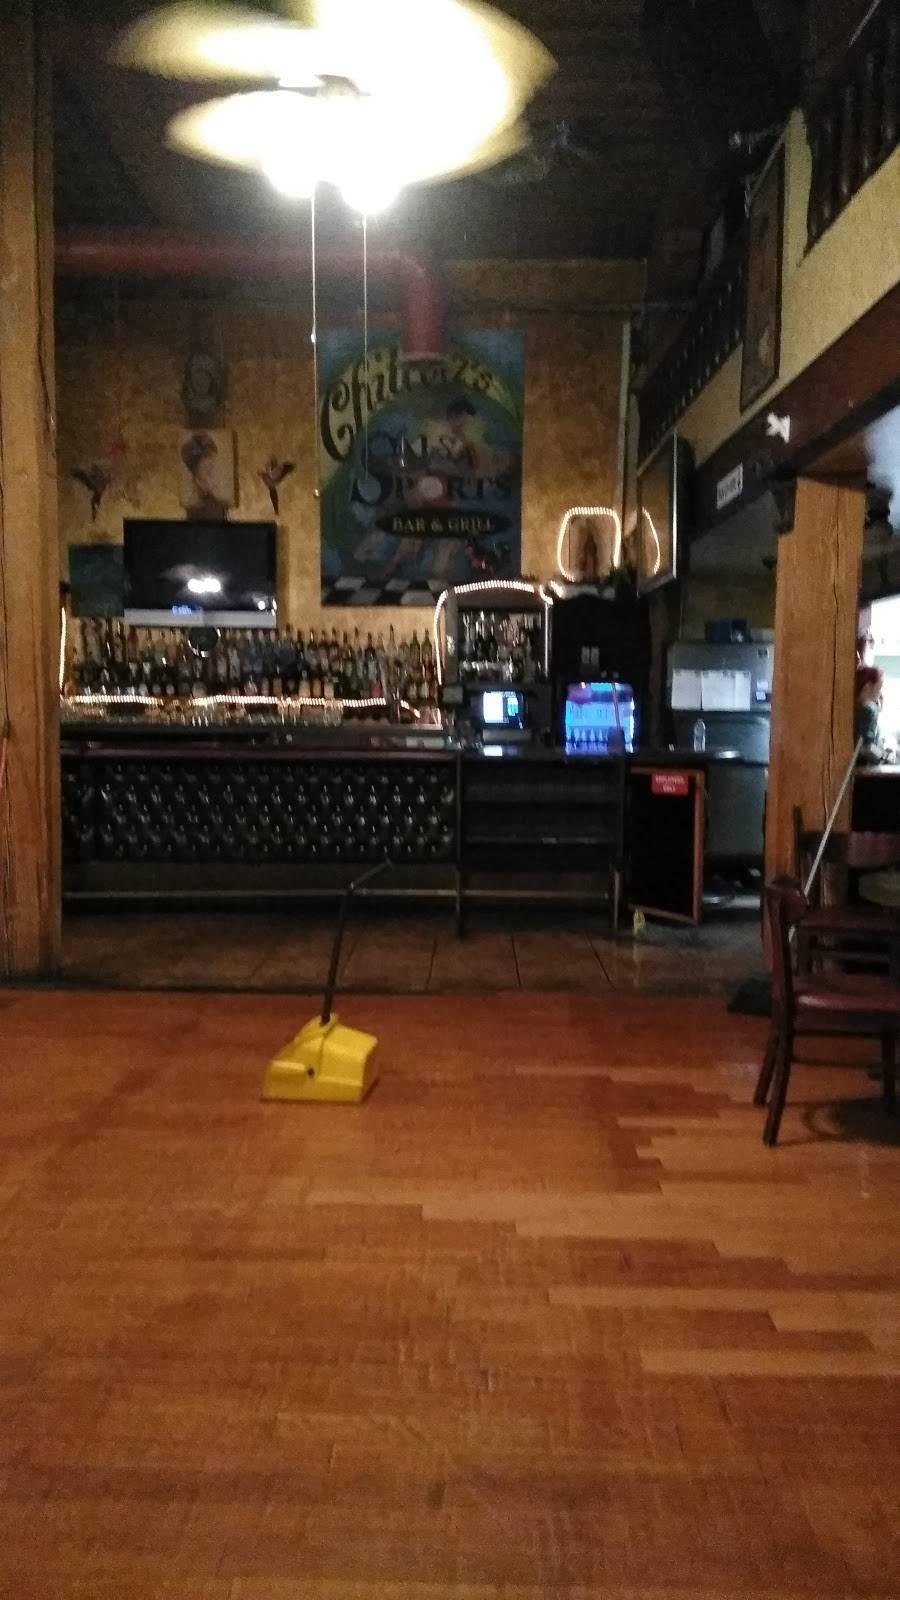 Chitivas Salsa & Sports Bar | night club | 445 W Weber Ave #122, Stockton, CA 95203, USA | 2099418605 OR +1 209-941-8605